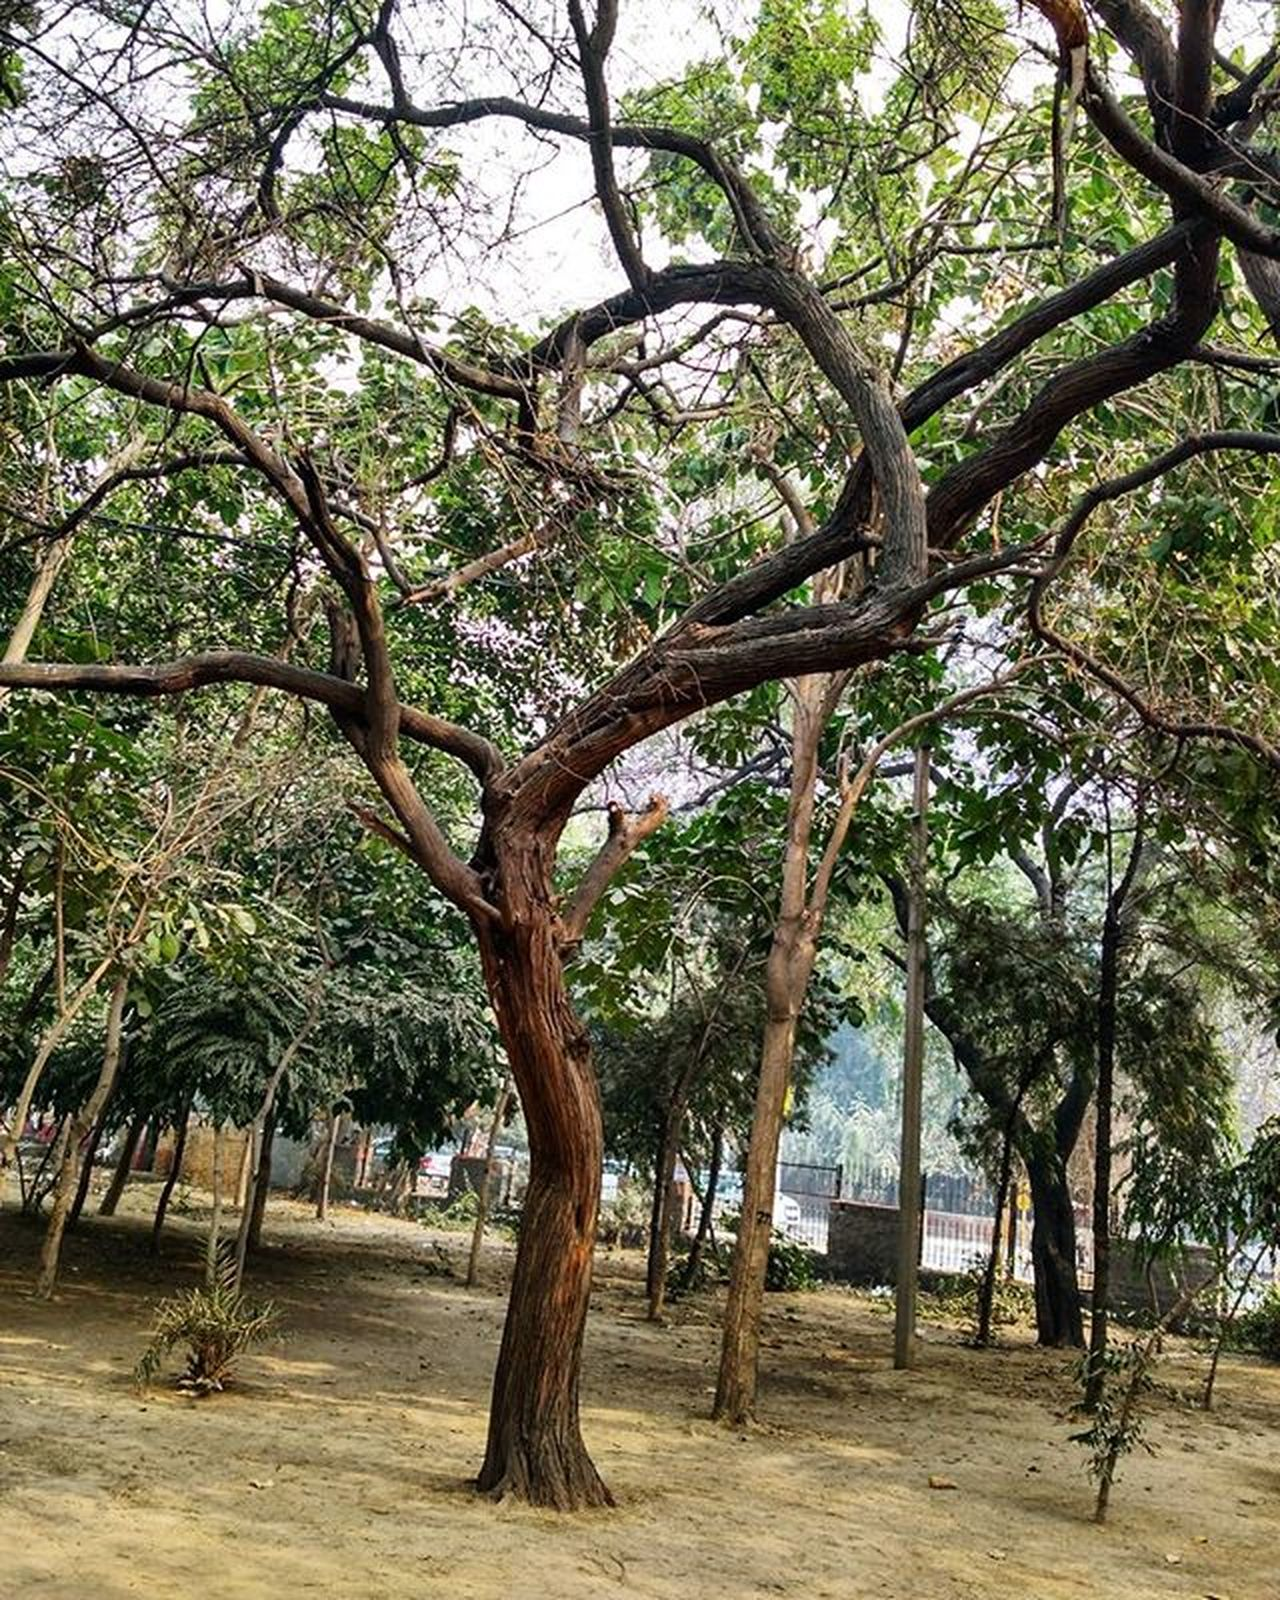 T R E E Tree Trees Nature Naturephotography Photography Instagram Instagood Instalike Instapic Doubletap India Indian Park Sky Wilderness Phonography  Mi4photography Mi4phonography Mi4